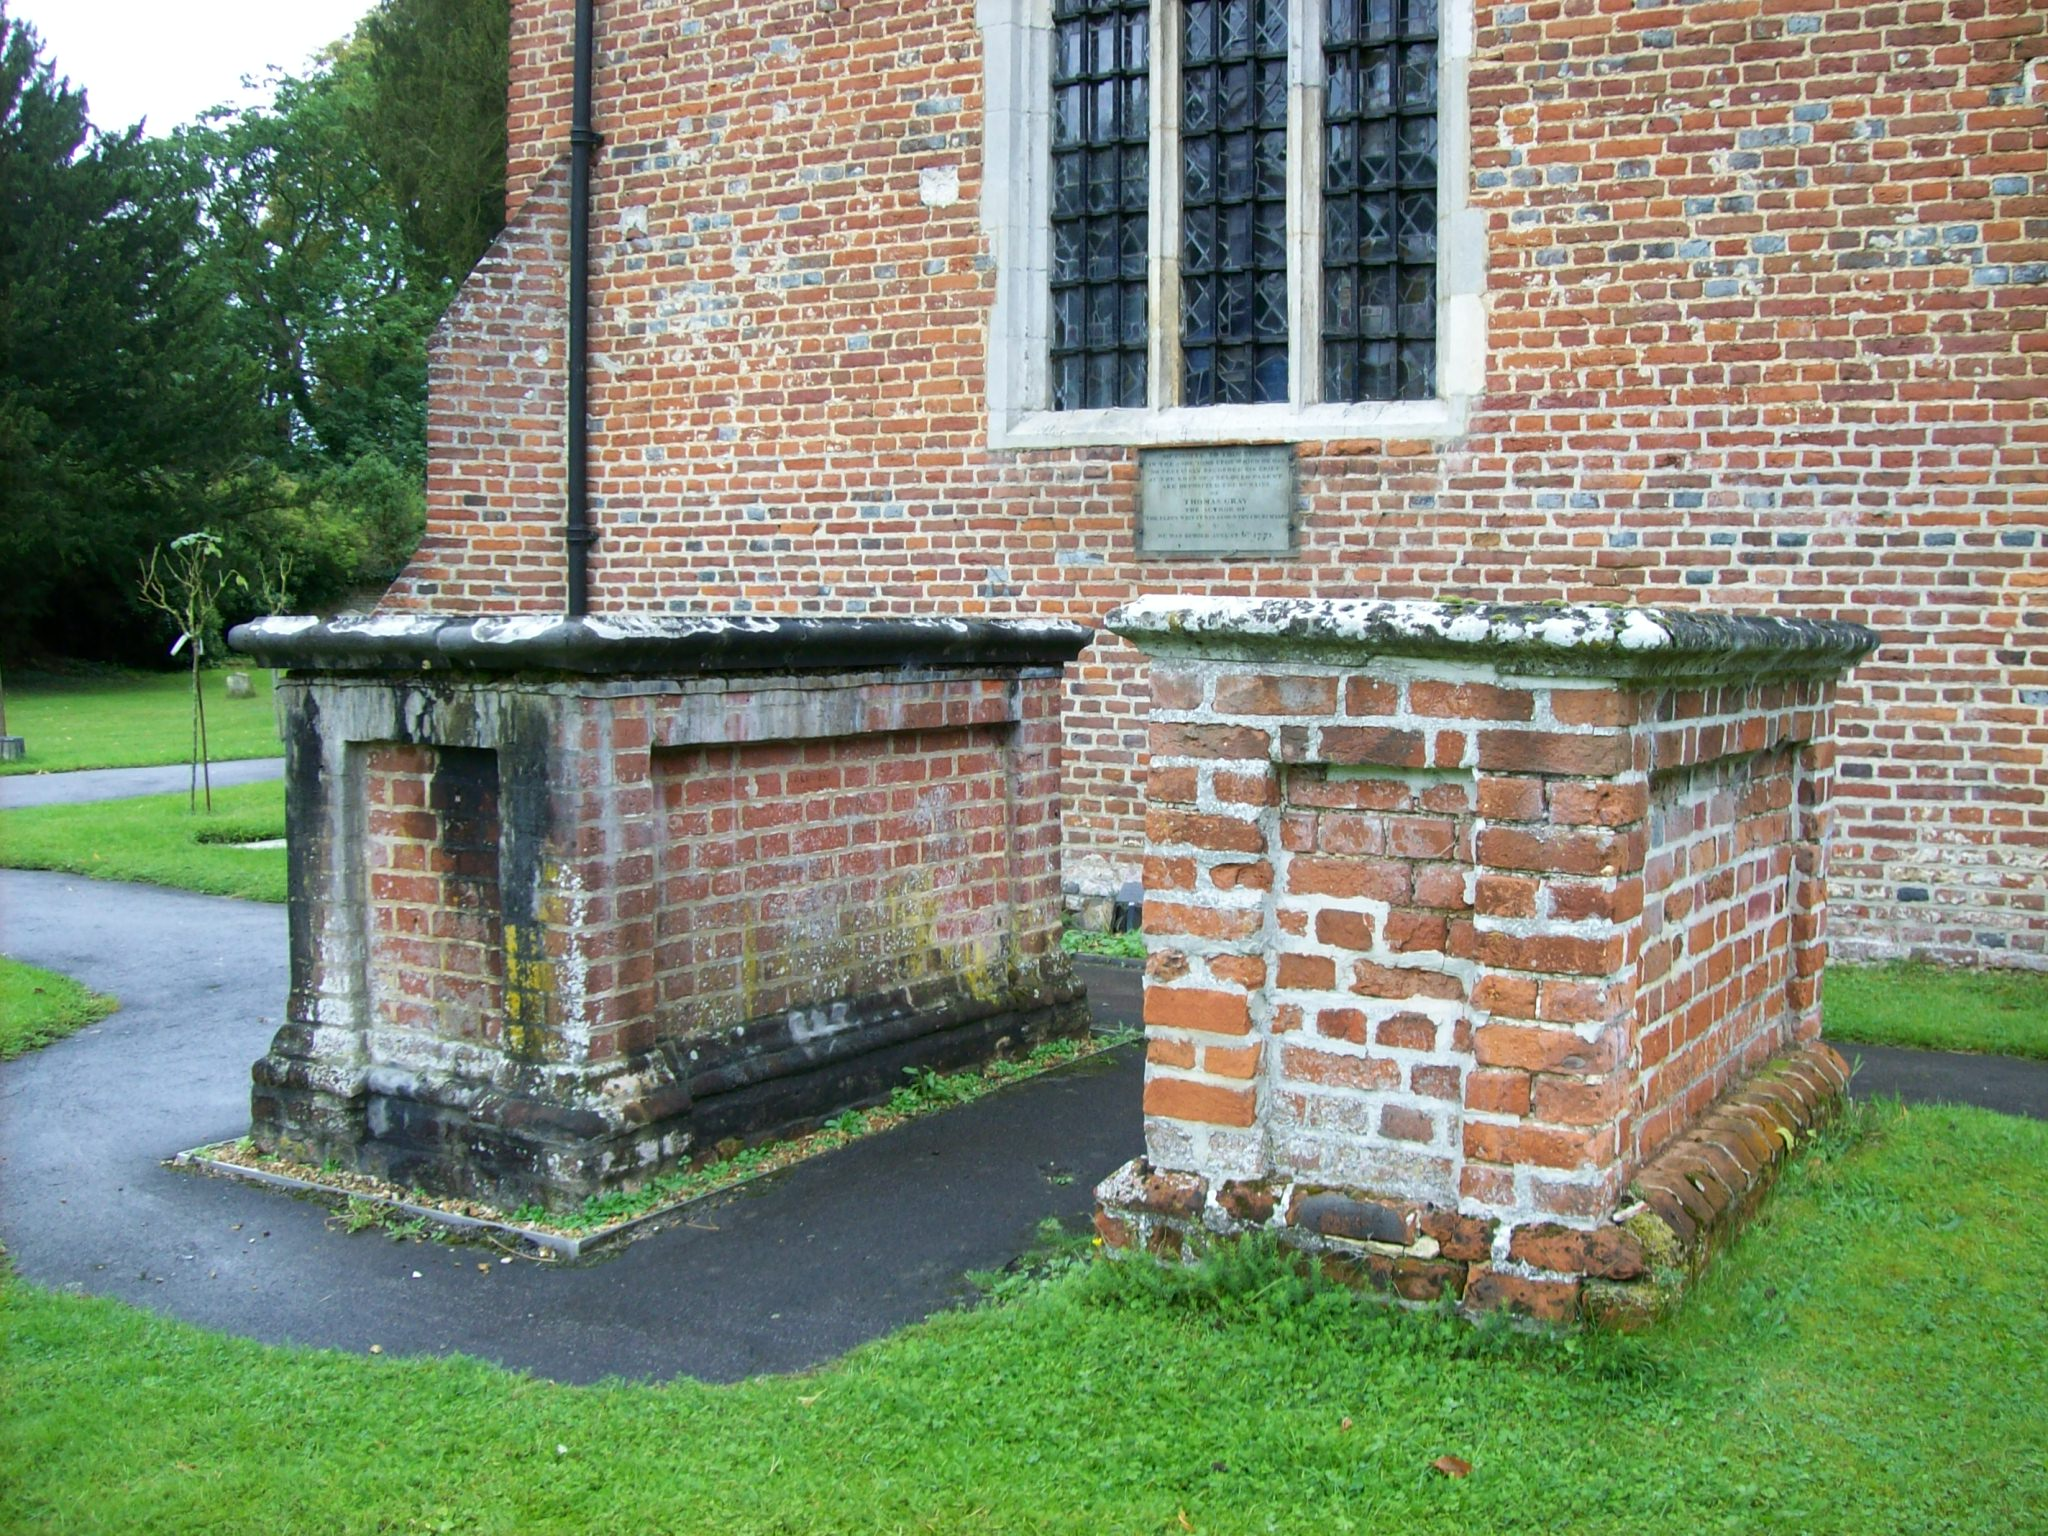 File:Gray's tomb, Stoke Poges.jpg - Wikimedia Commons